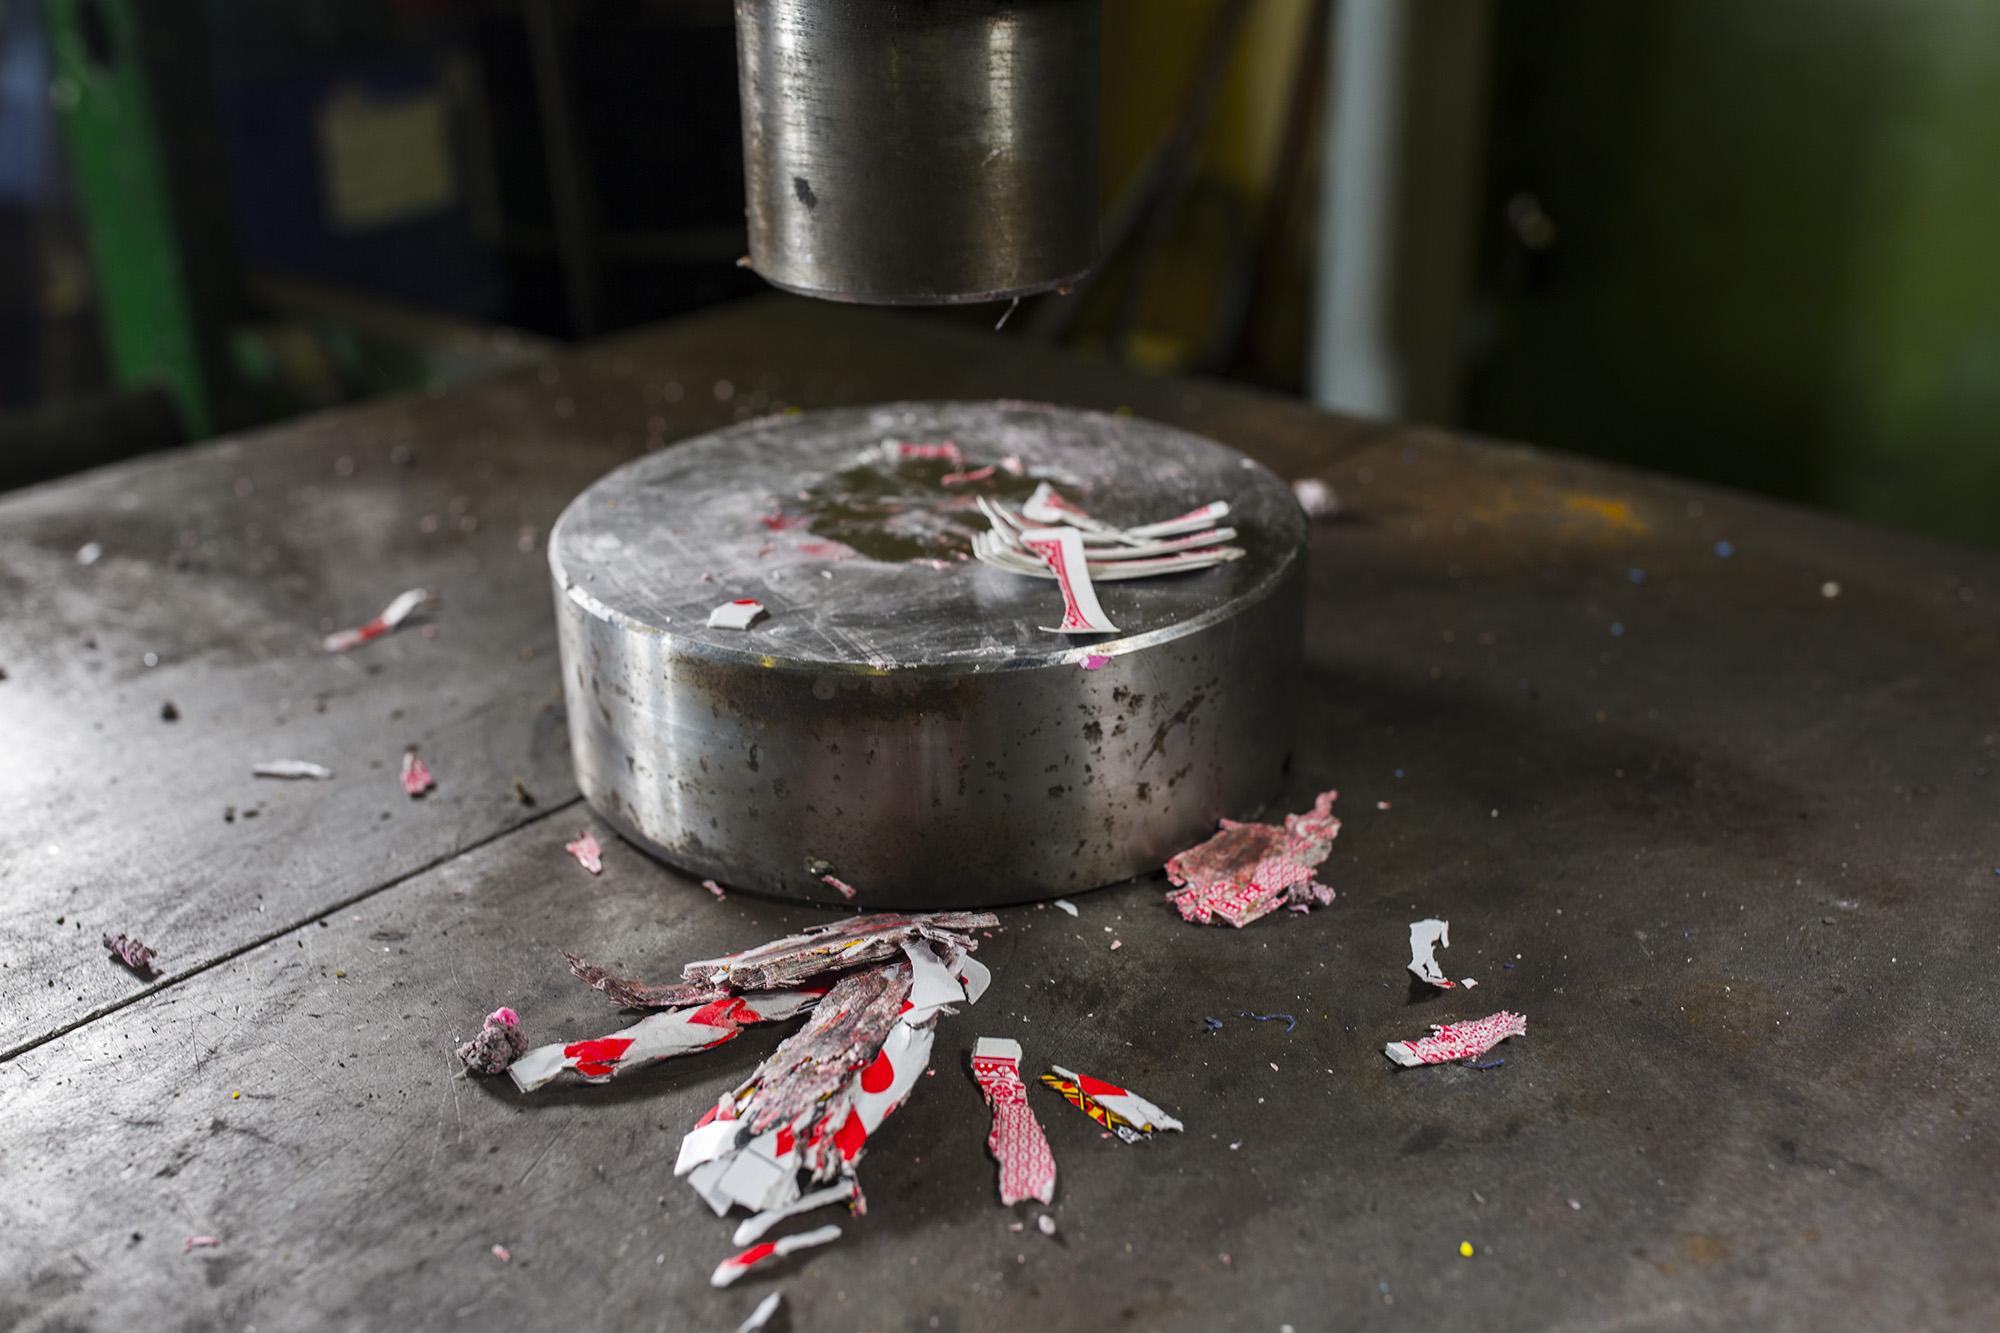 Hydraulipuristin ja murskattu korttipakka.